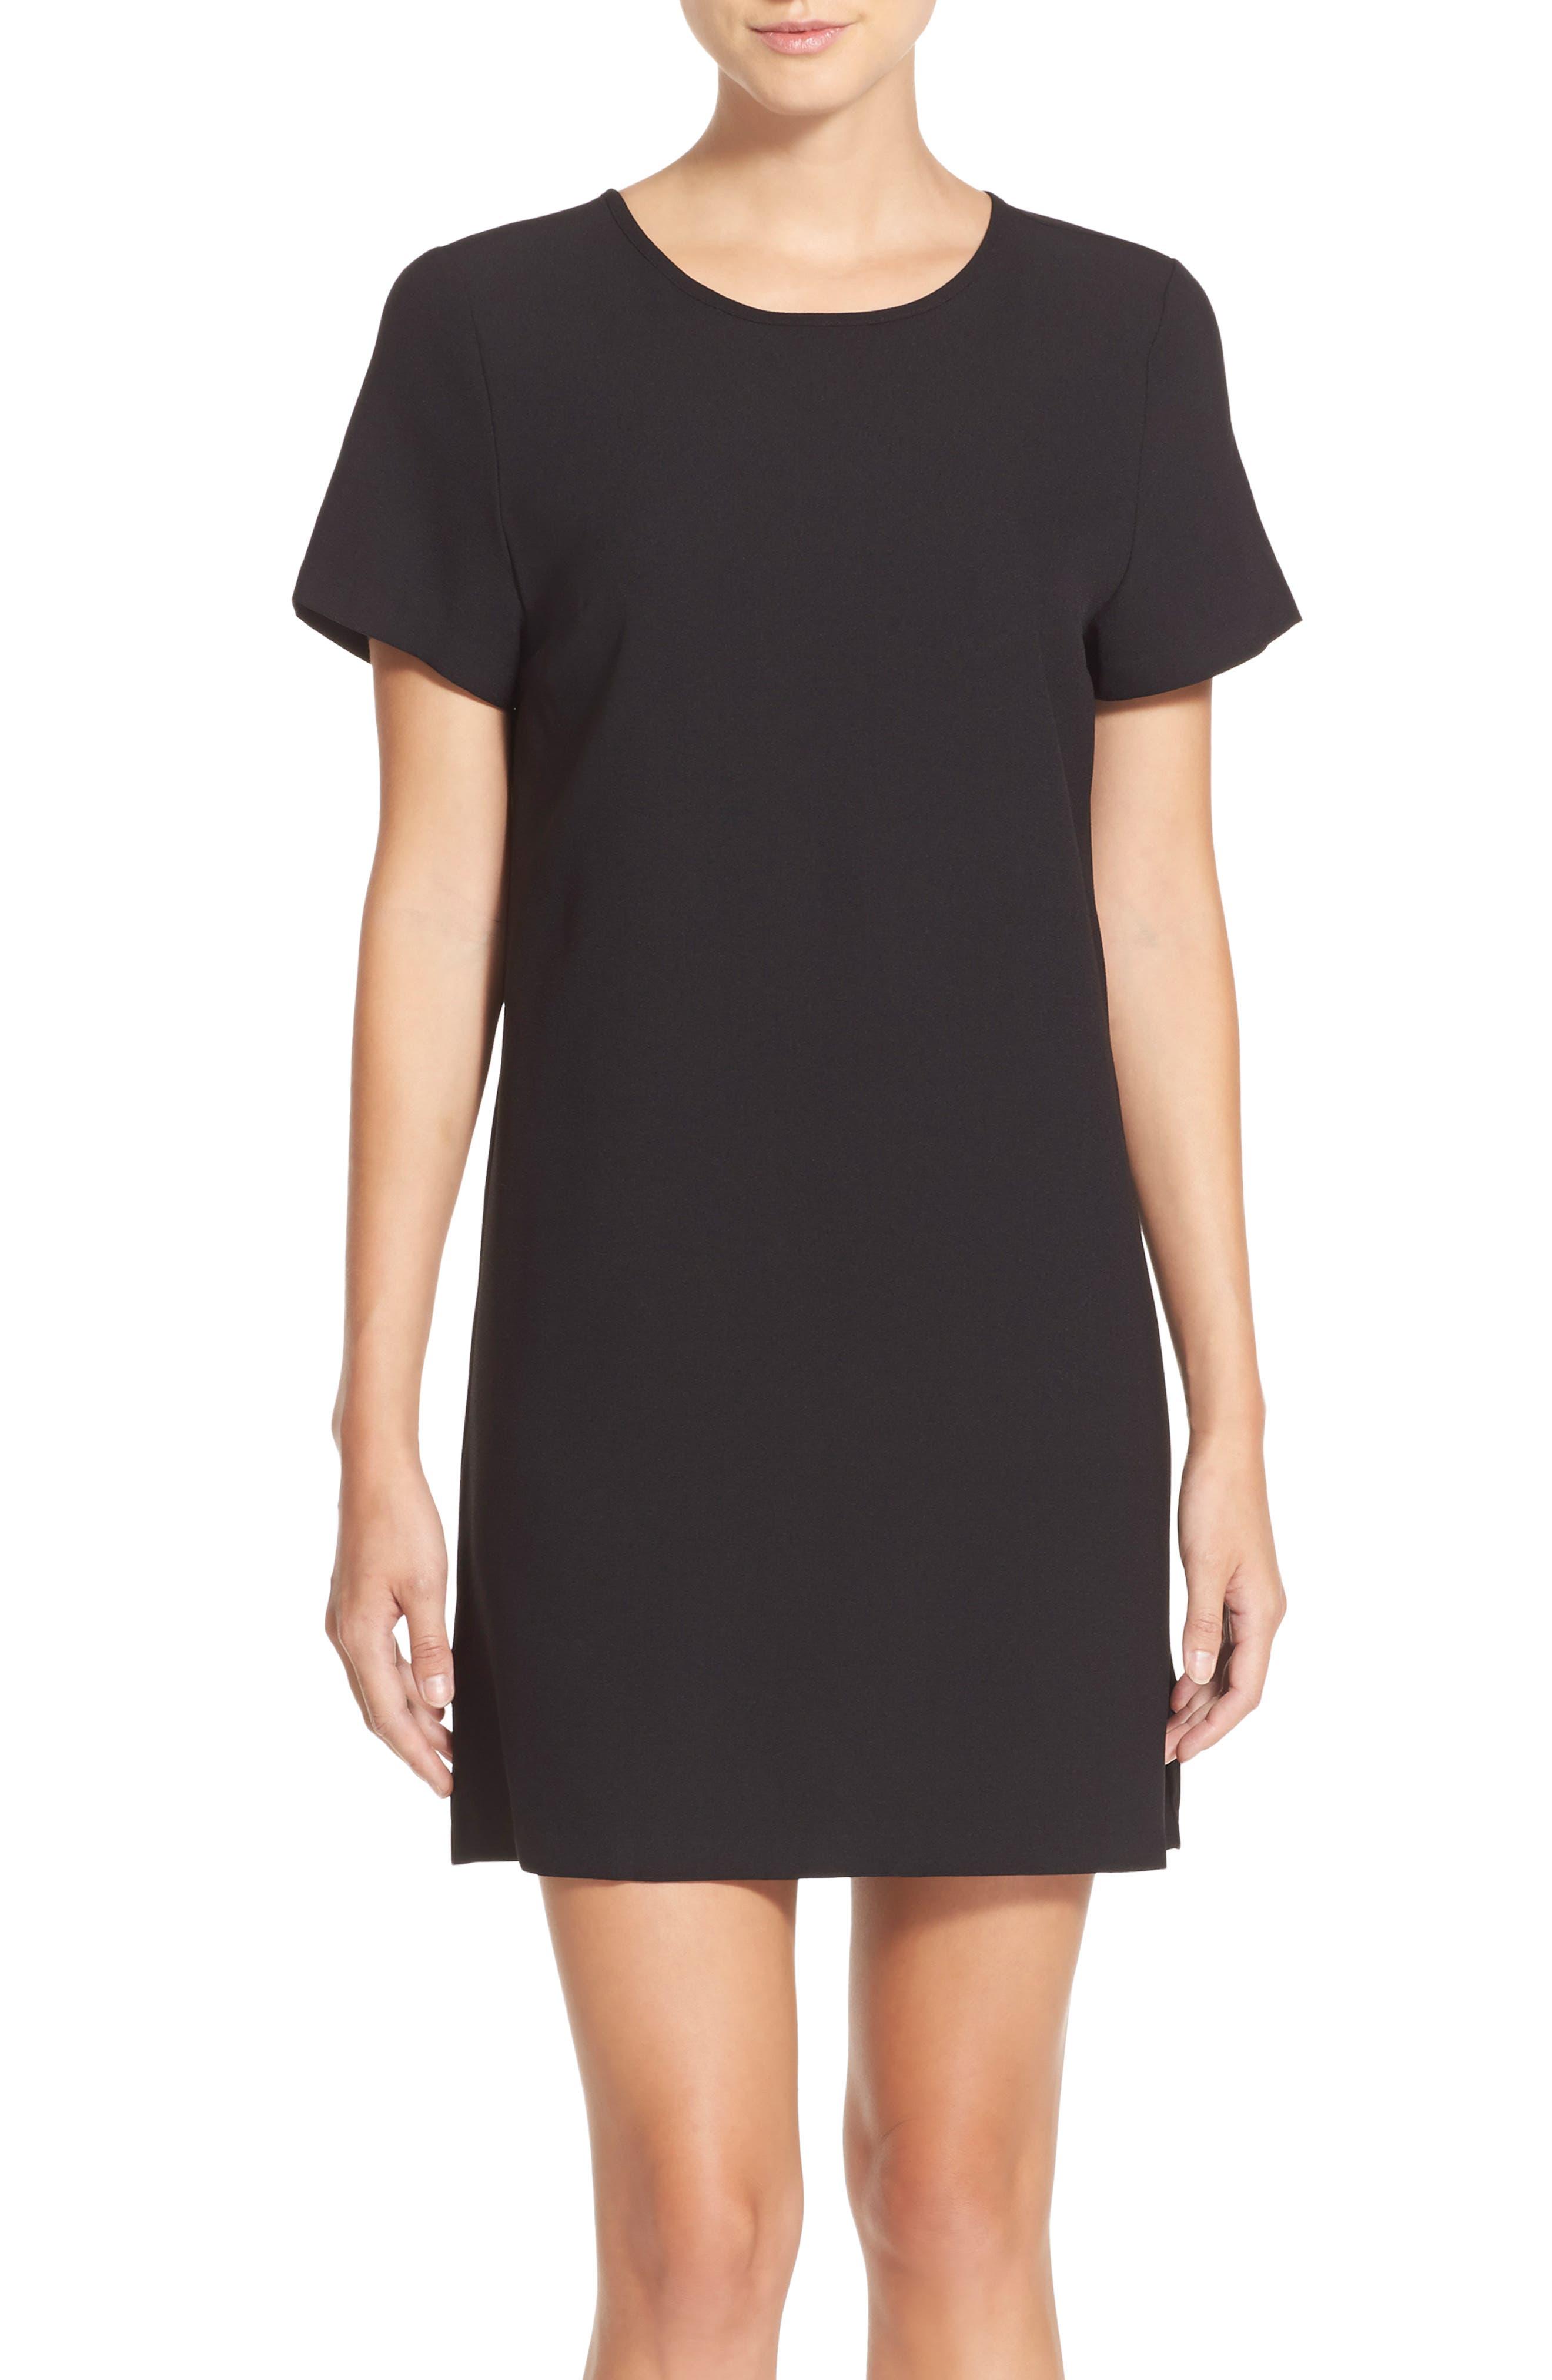 FELICITY & COCO Devery Crepe Shift Dress, Main, color, 001